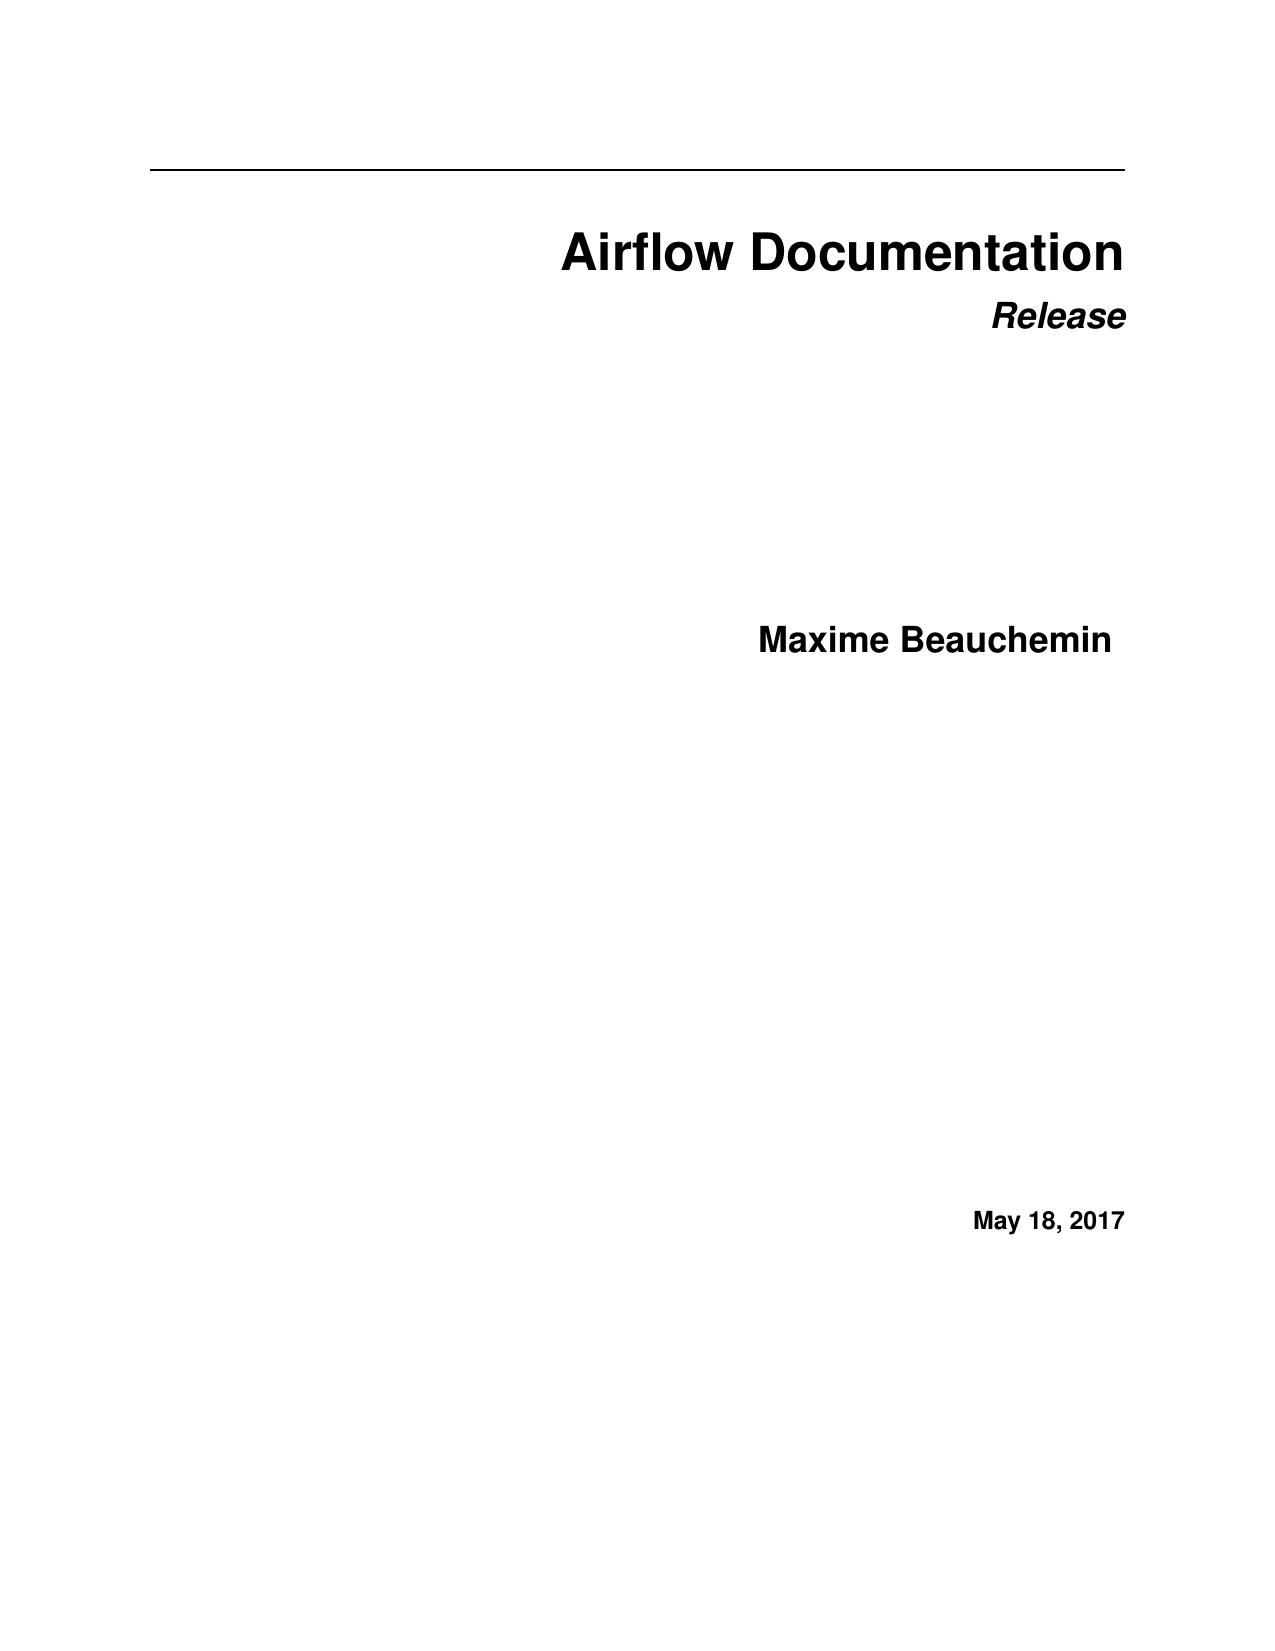 Airflow Documentation | manualzz com